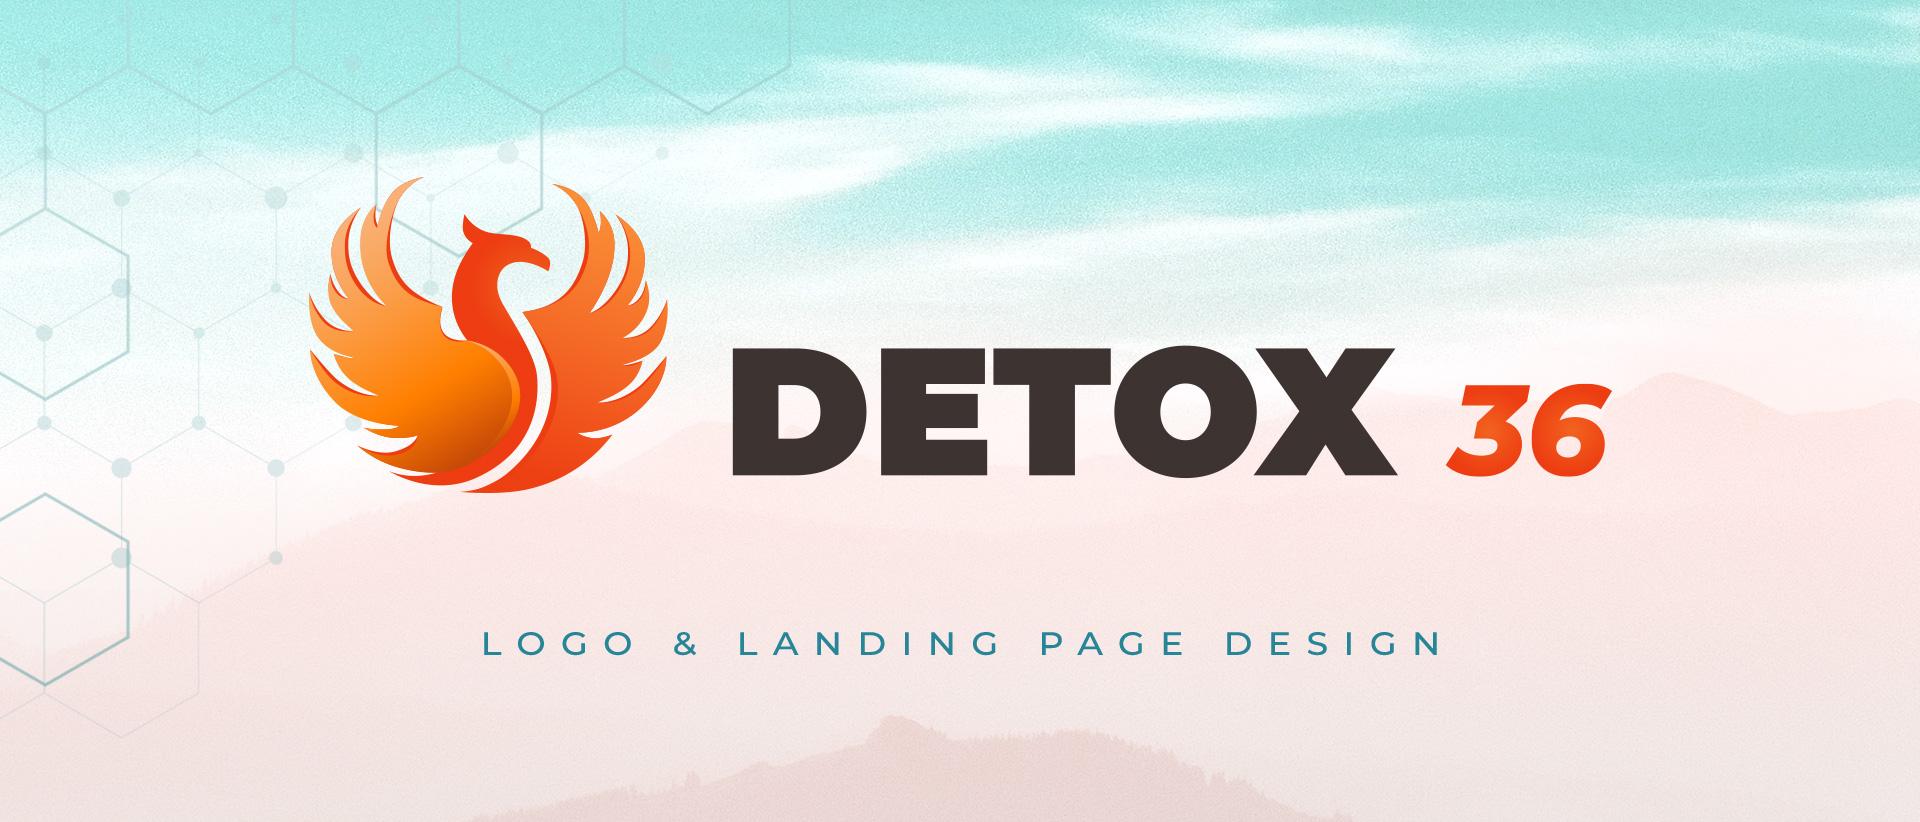 Logo detox36